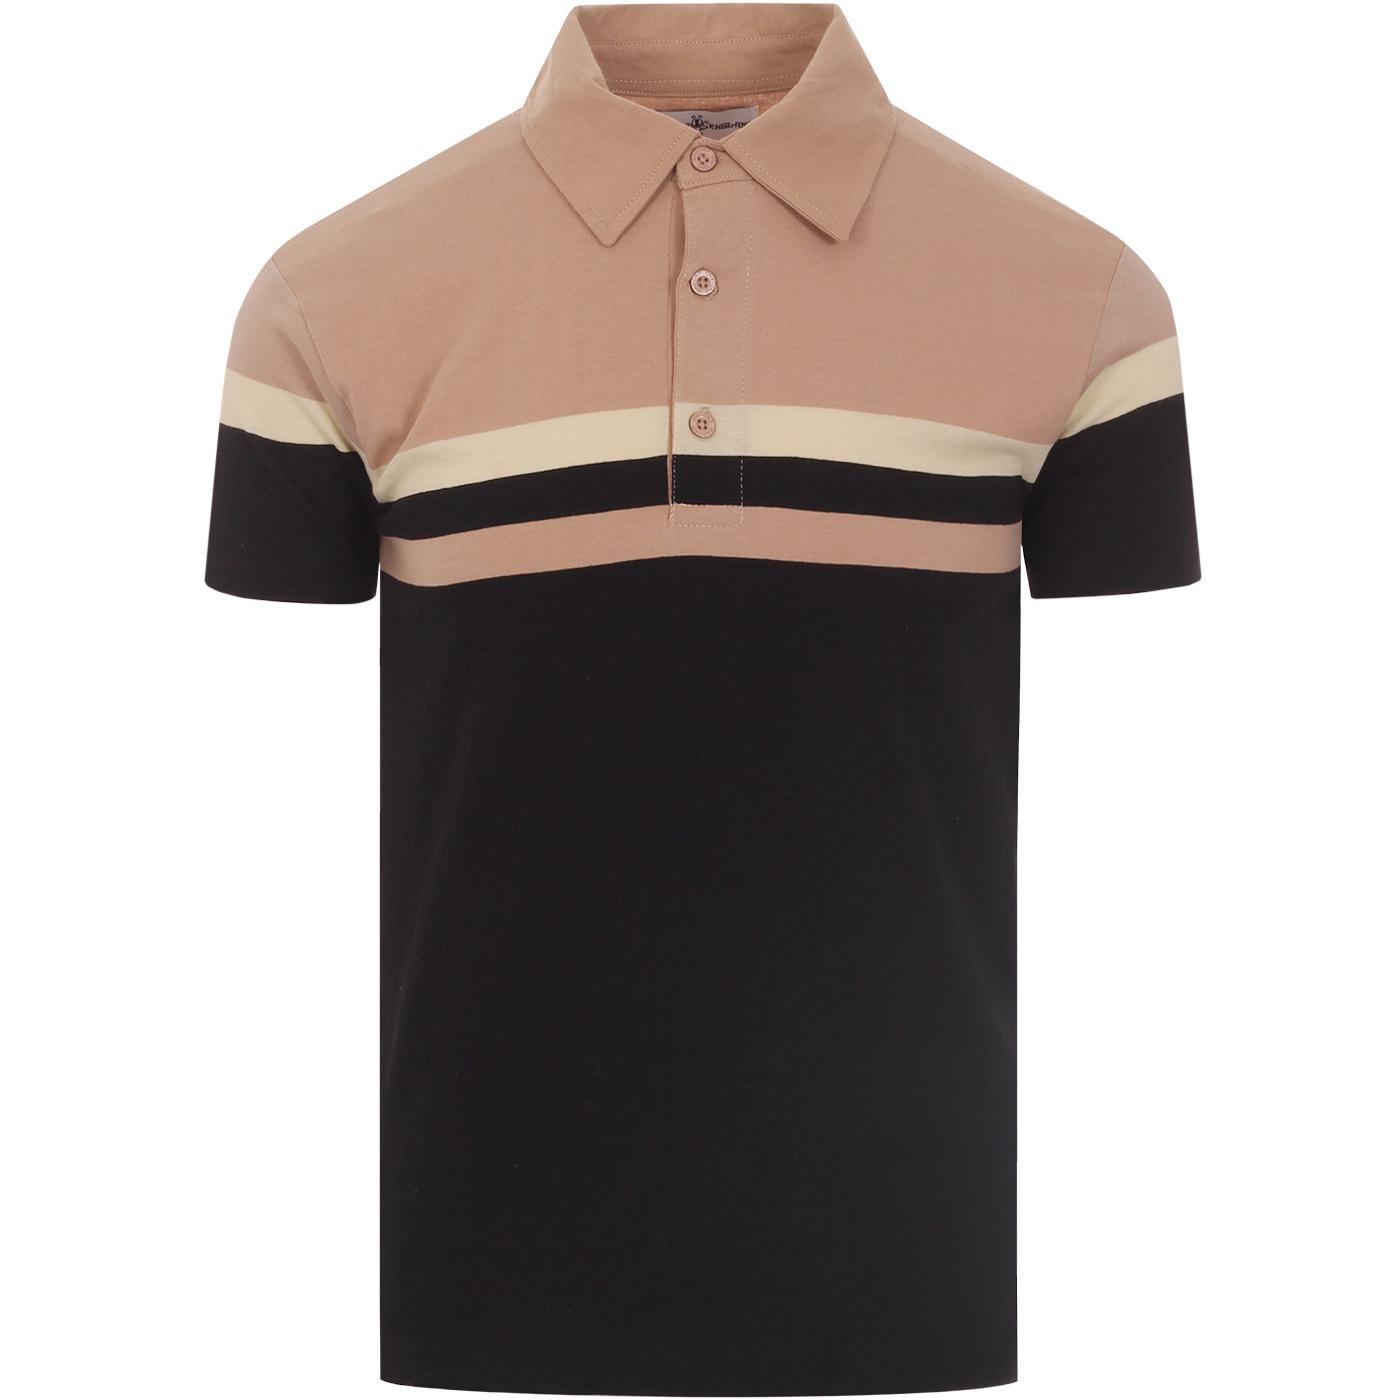 Jimmy The Gent MADCAP ENGLAND Mod Stripe Polo (B)